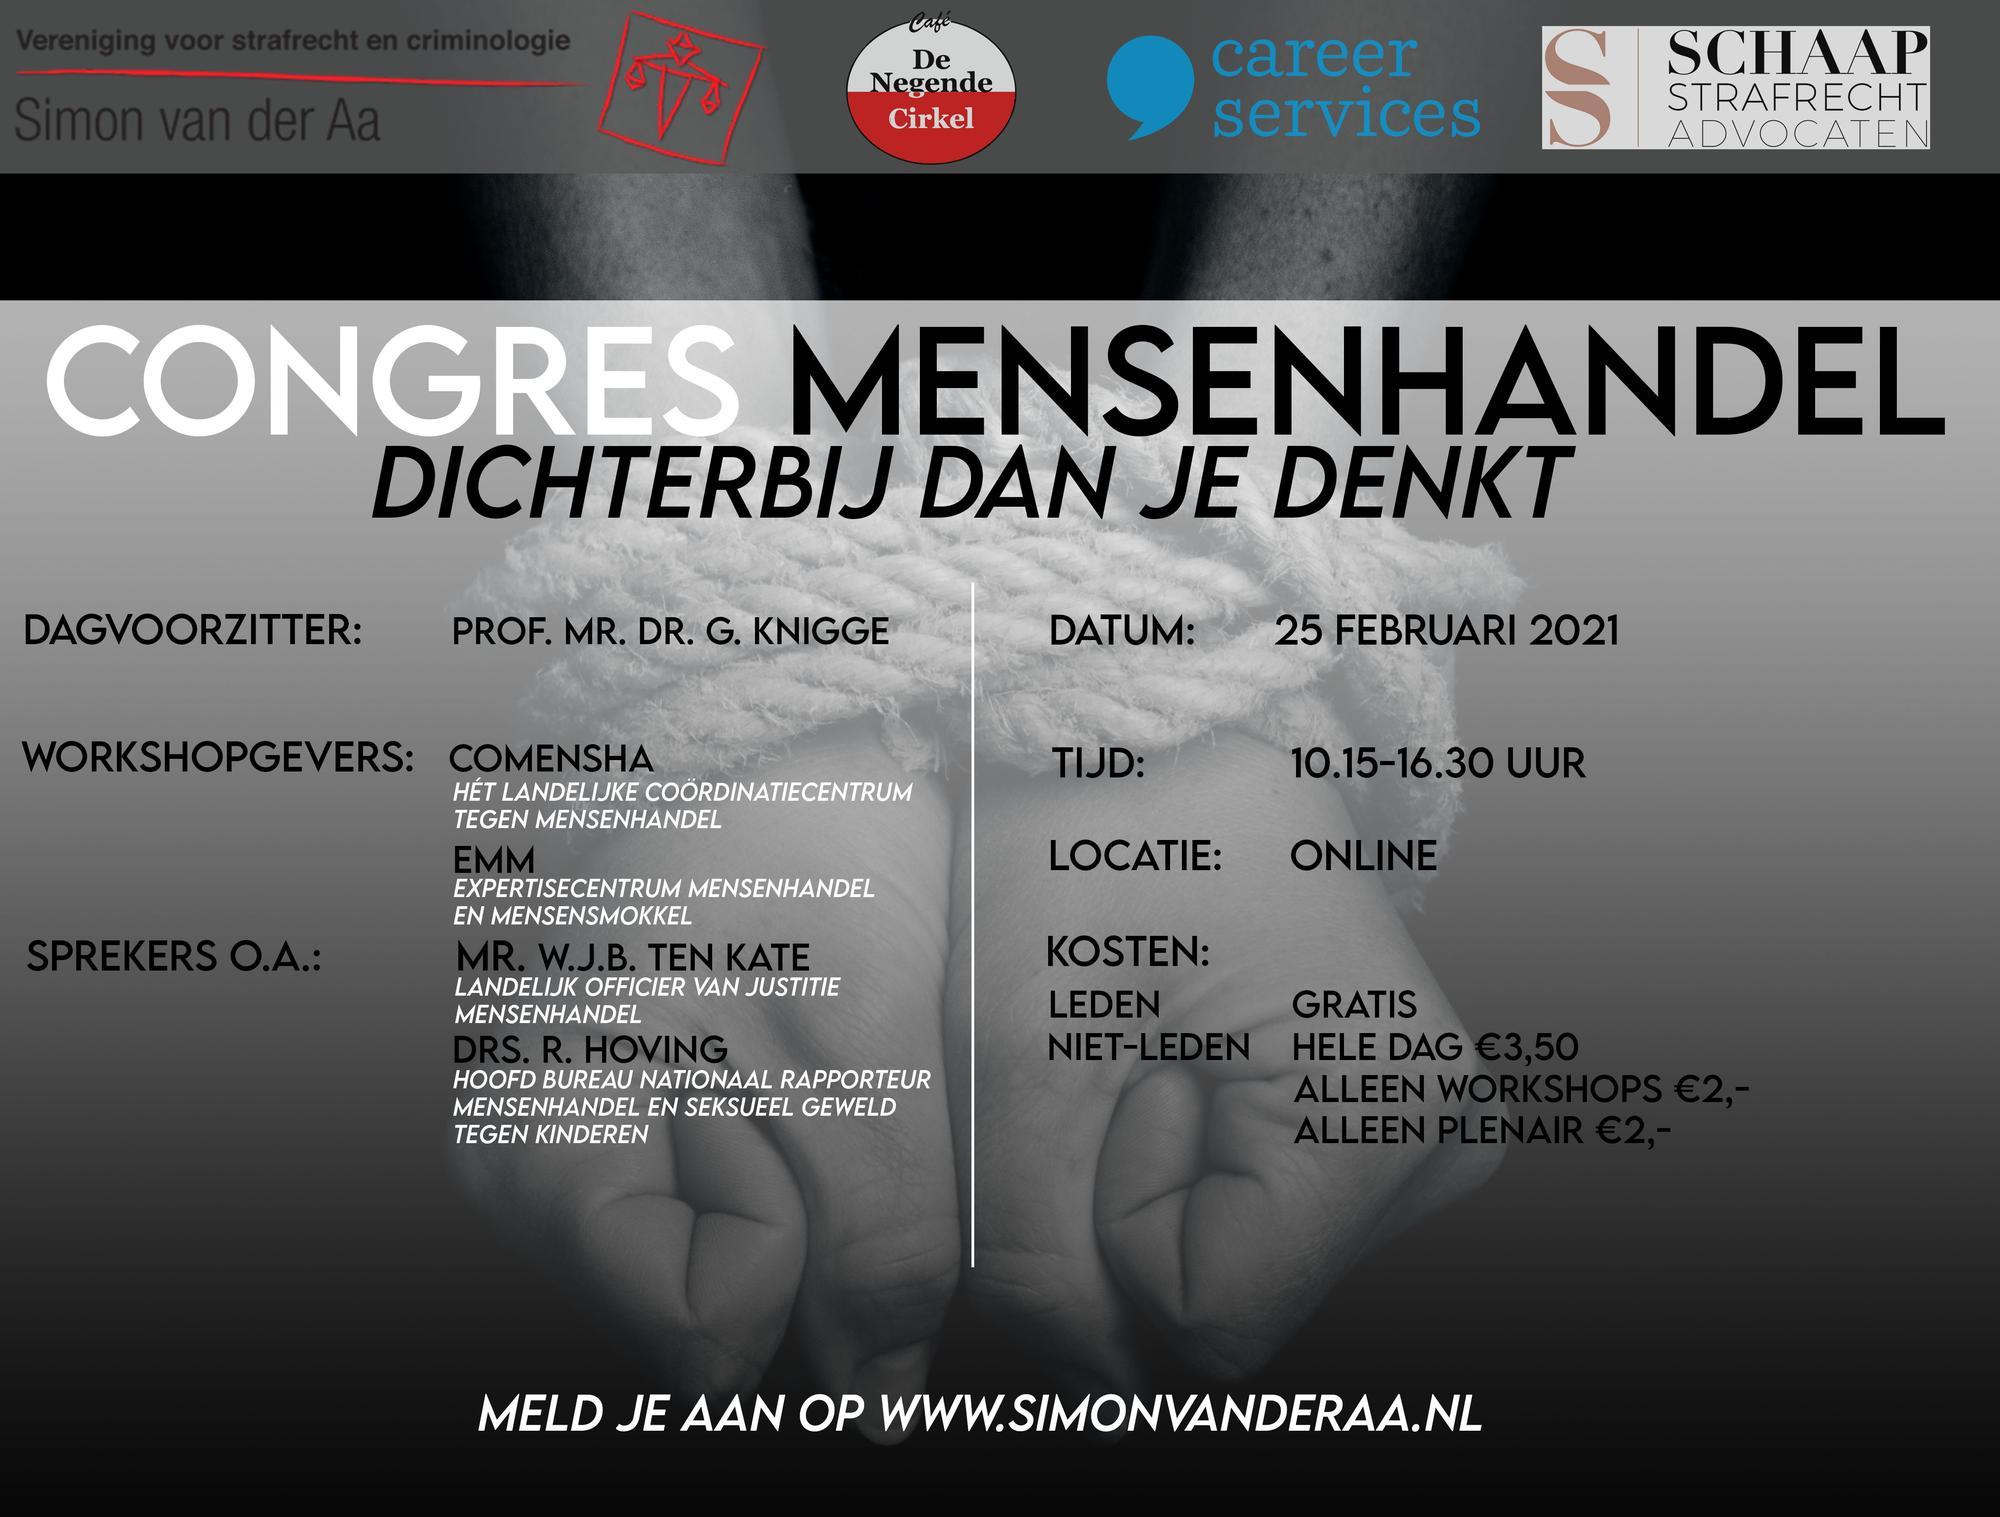 Congres Mensenhandel